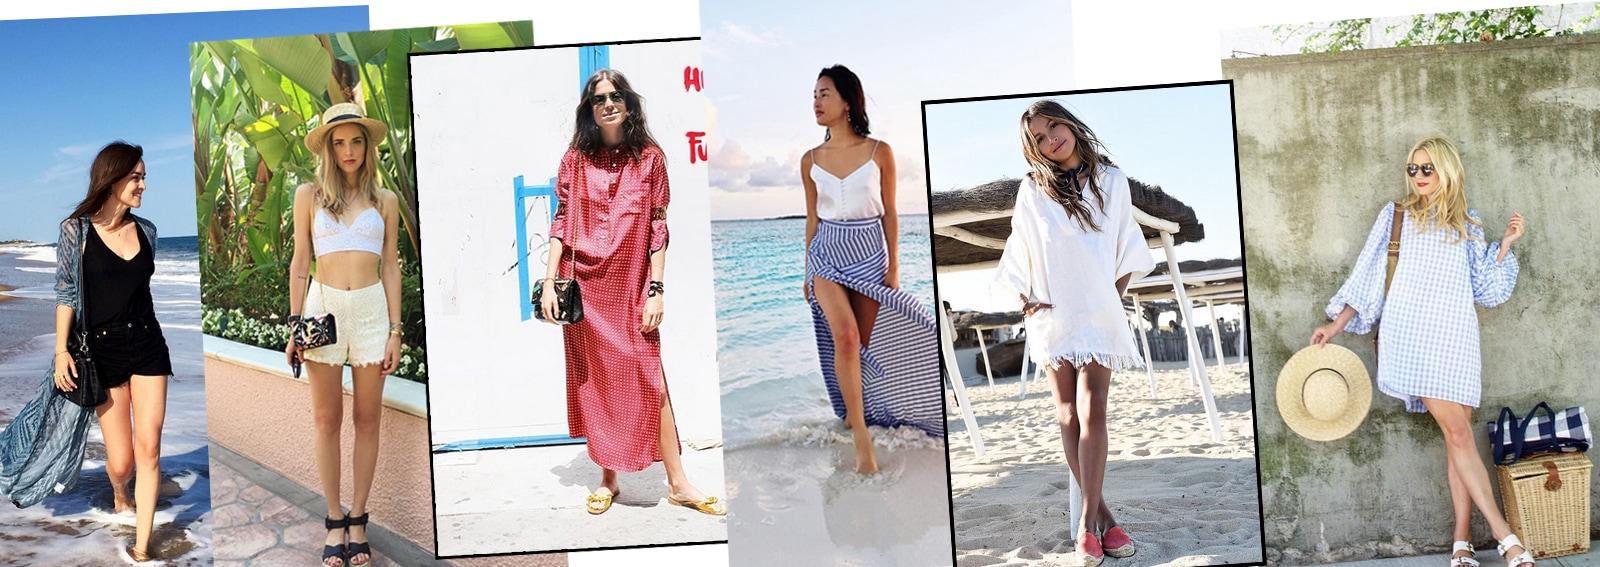 COVER-look-aperitivo-spiaggia-DESKTOP